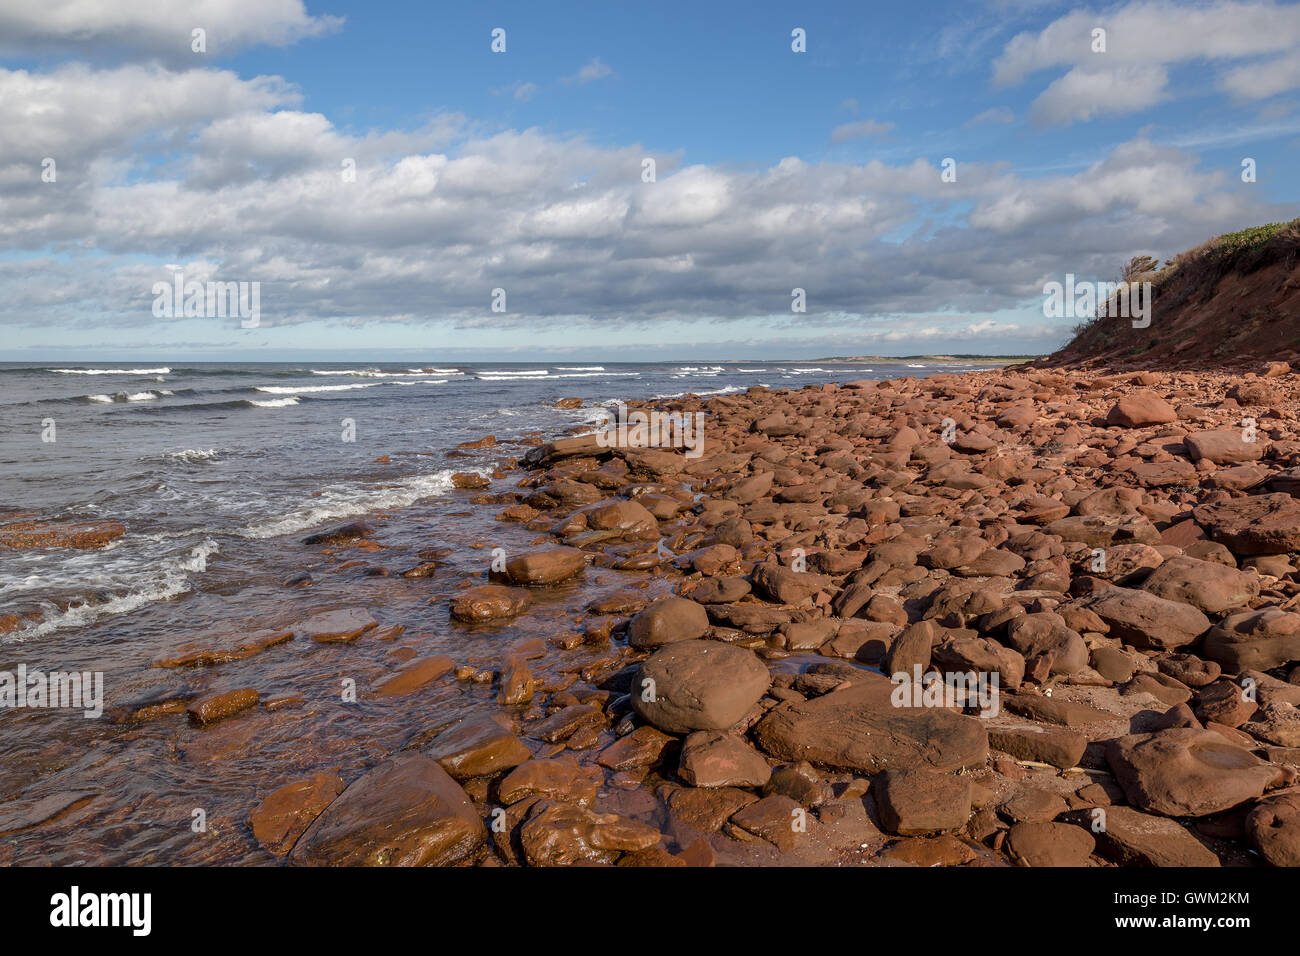 Beaches and coasts of Prince Edward Island. Gulf of Saint Lawrence. - Stock Image